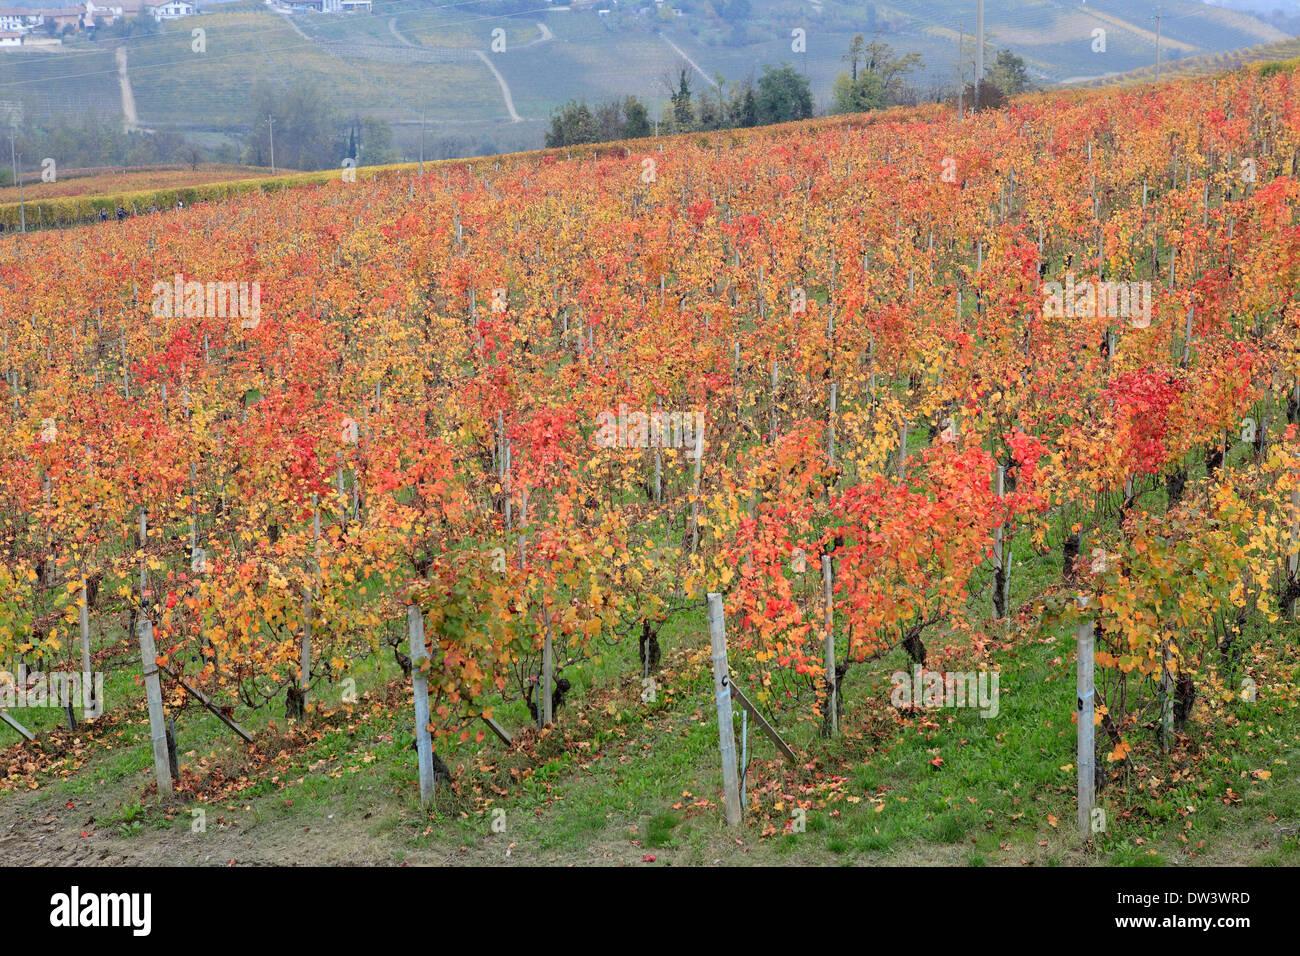 Farm winery vineyard in the Langhe region, Piedmont, Italy